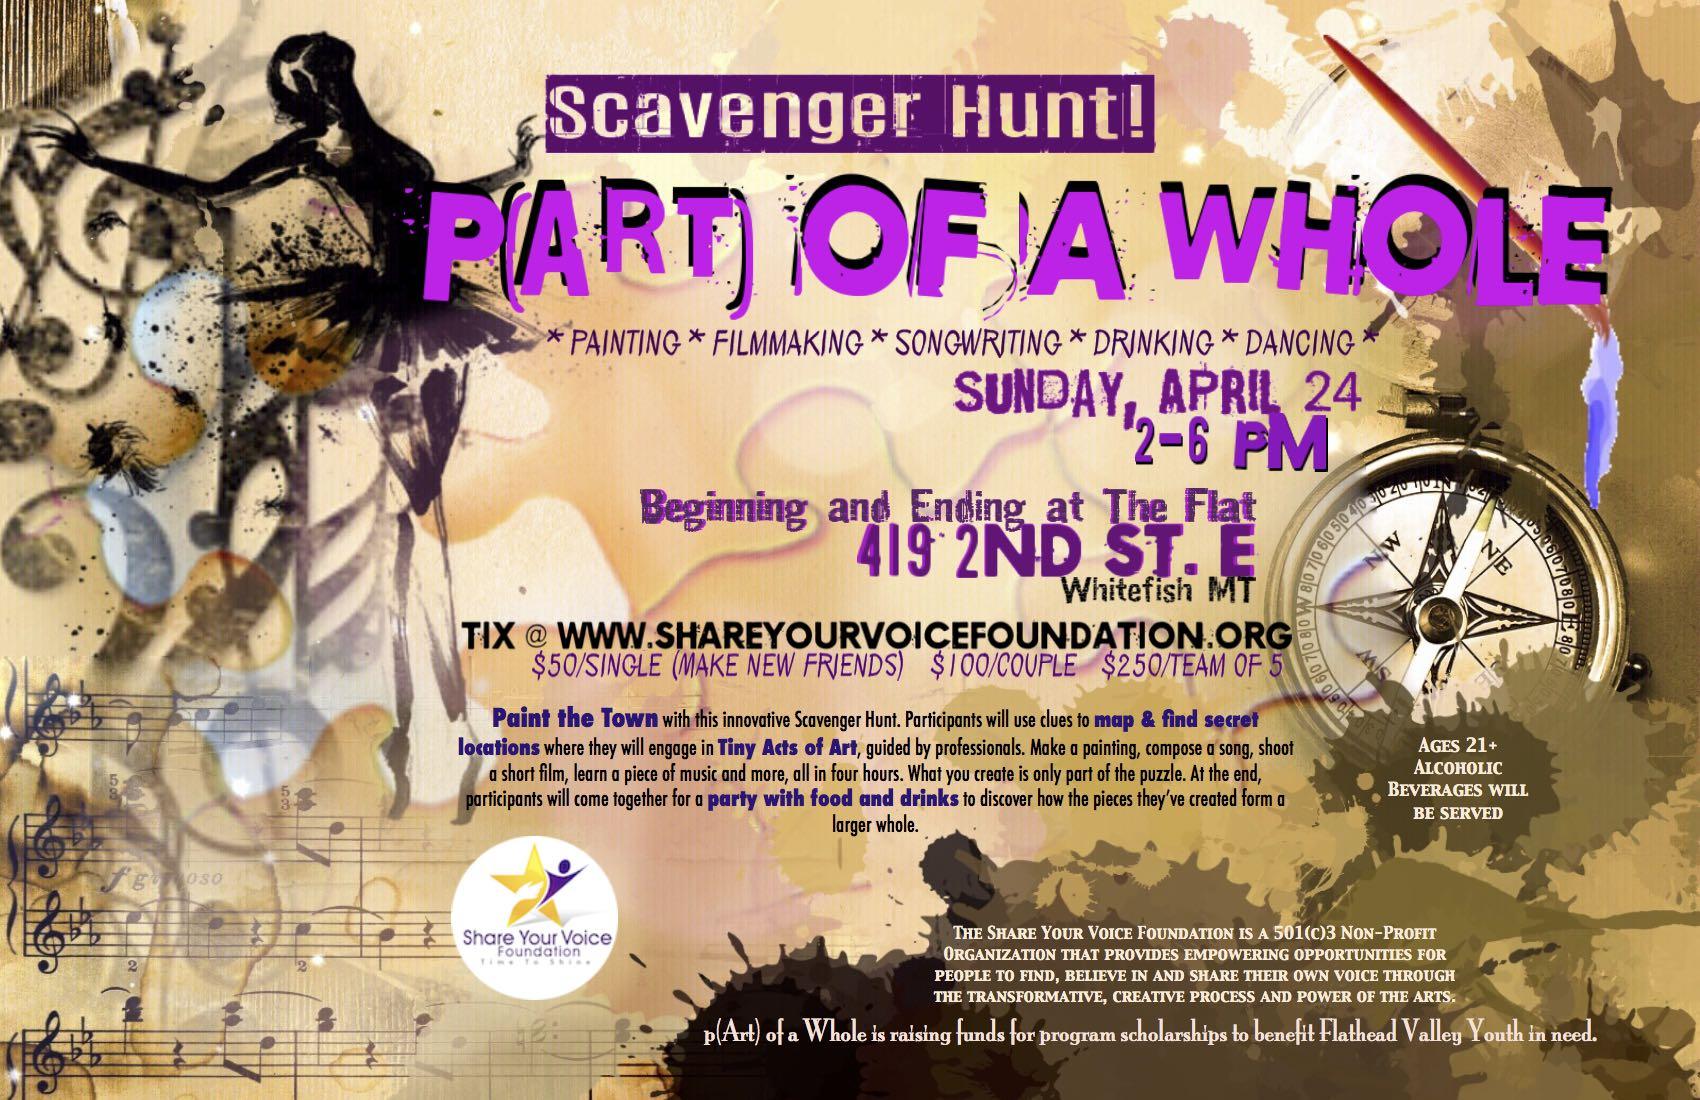 p(Art) of a Whole Scavenger Hunt